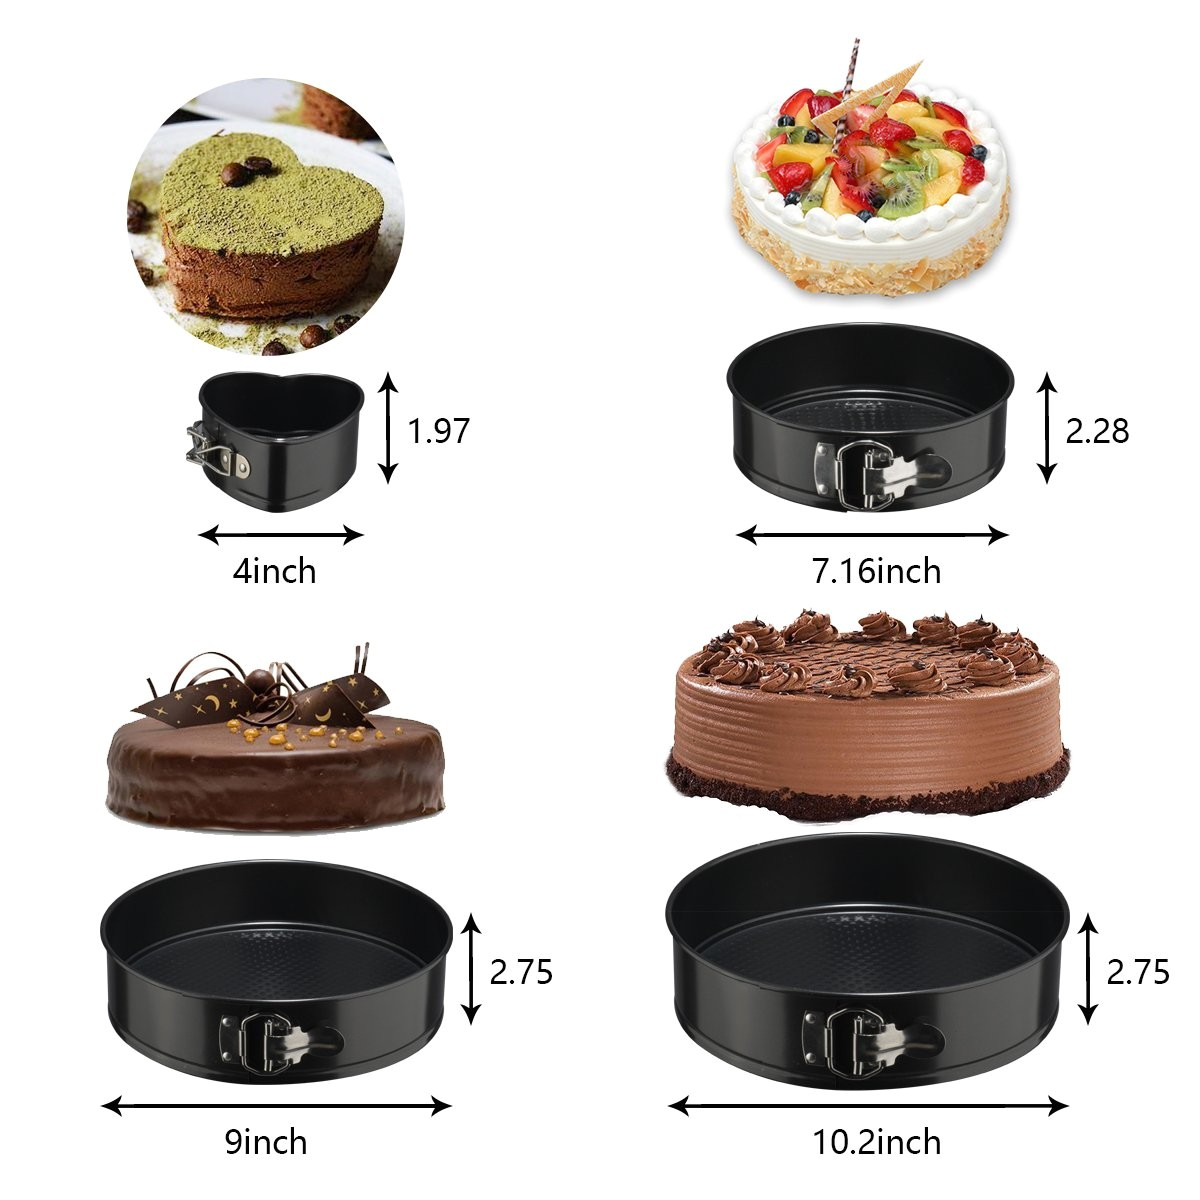 amazon com springform cake pan set 3pcs round 7 9 10 and 1pcs heart shaped 4 premium leakproof nonstick steel cheesecake bakeware pan set kitchen